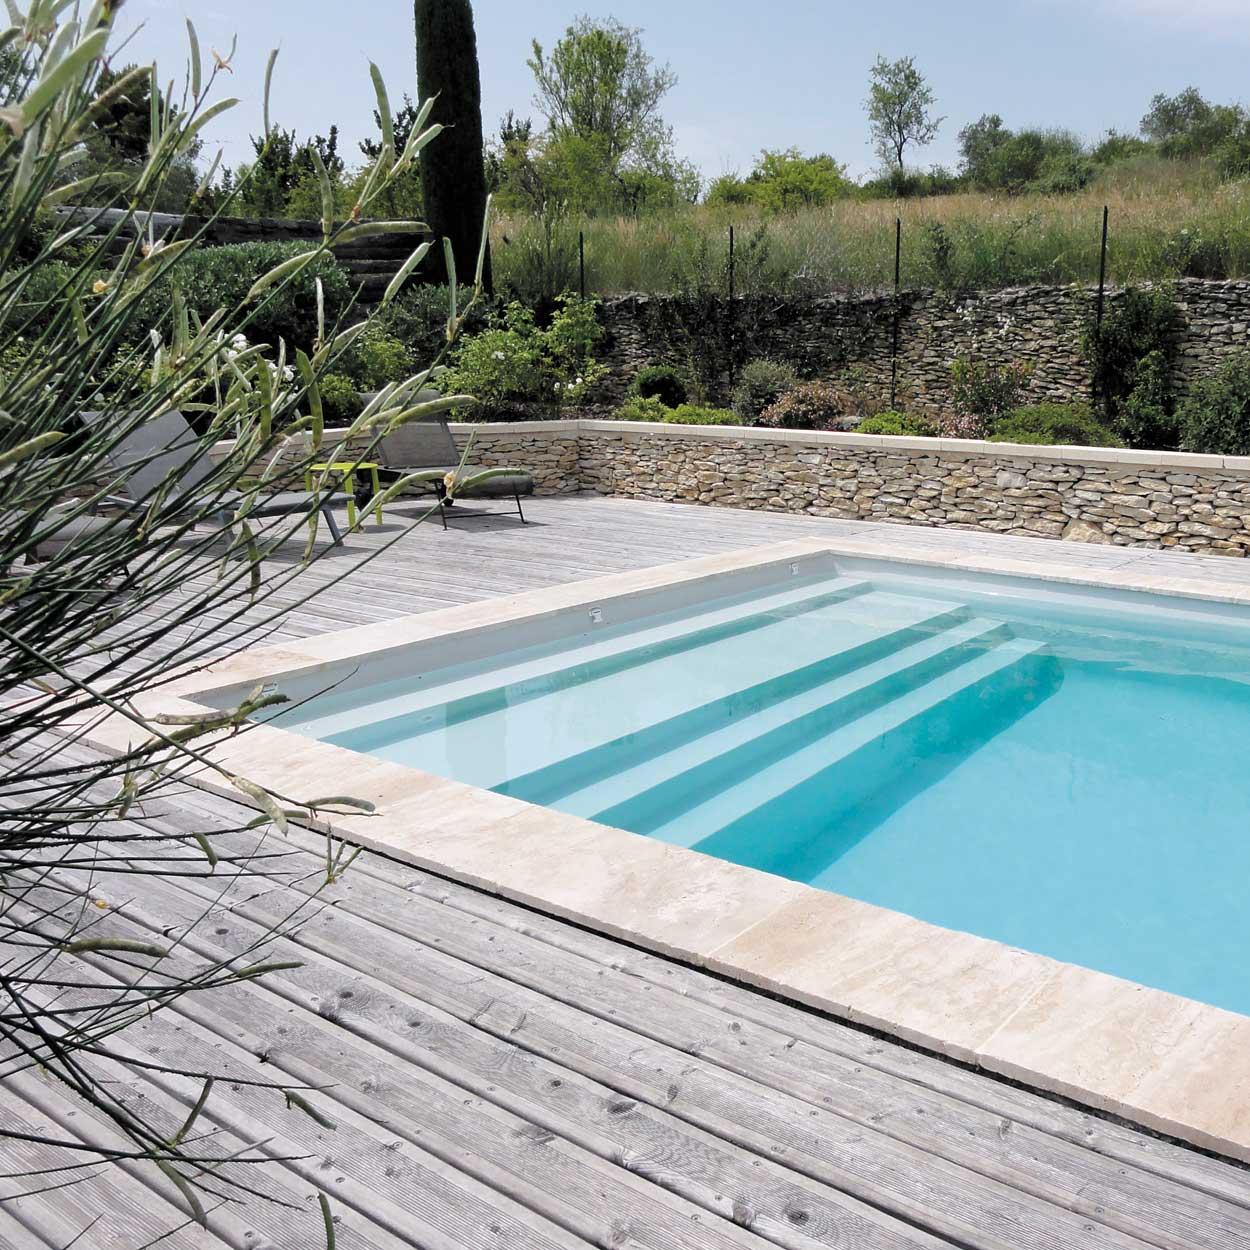 gp_figuerolle_piscine-coque Nos piscines coques